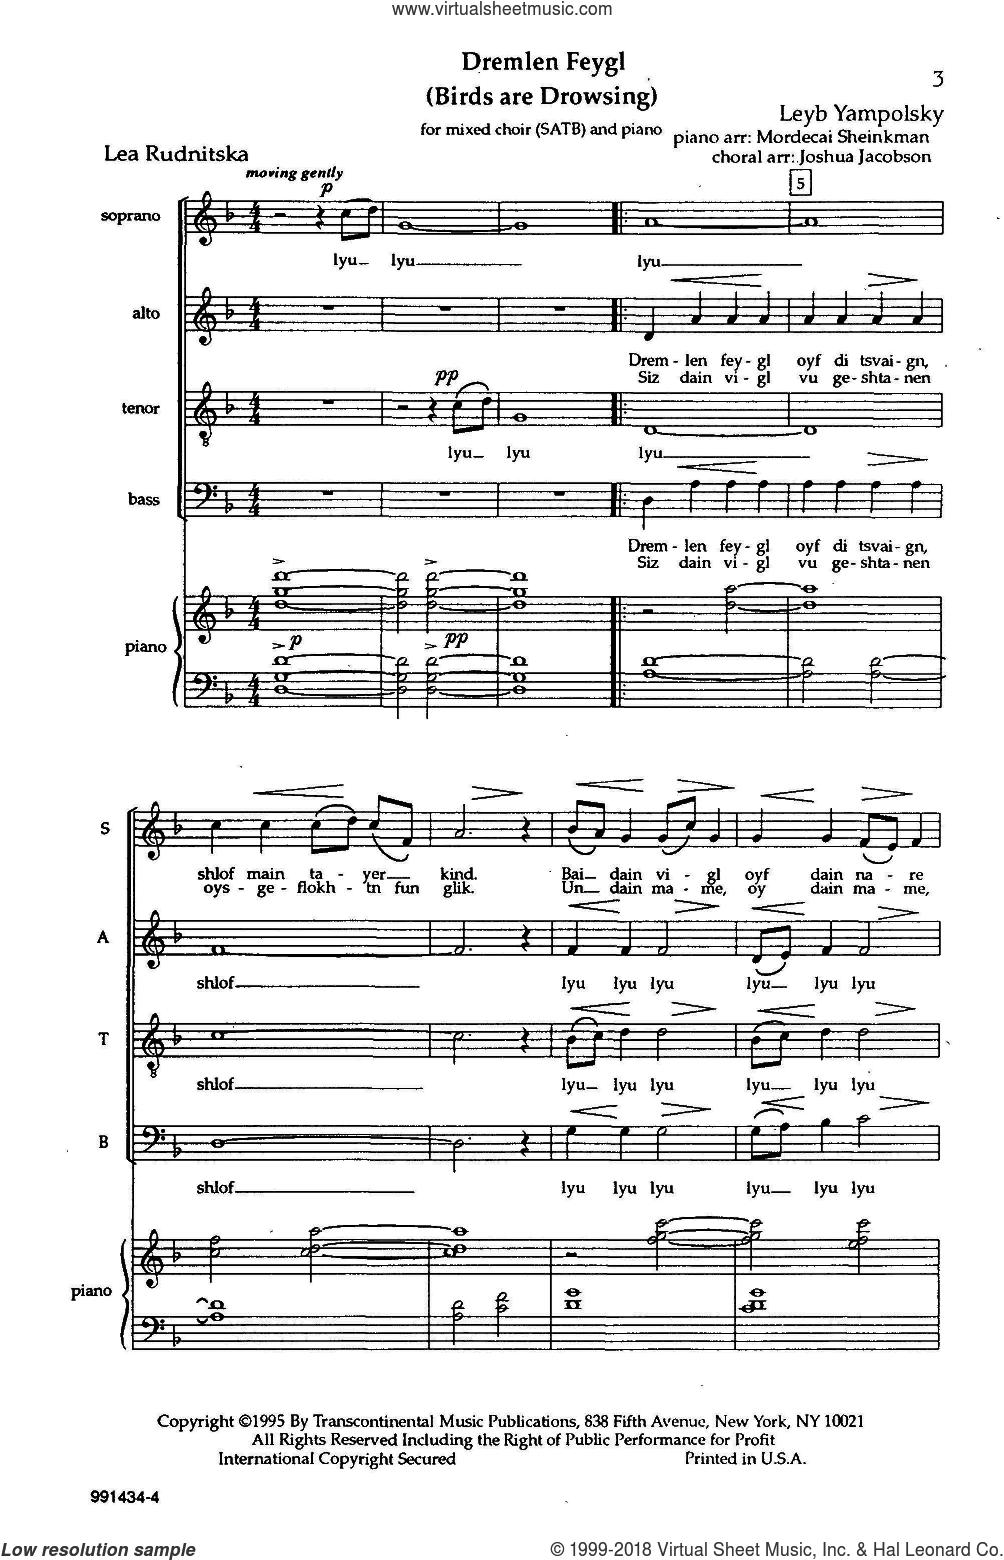 Dremlen Feygl (Birds Are Drowsing) sheet music for choir (SATB: soprano, alto, tenor, bass) by Joshua Jacobson and Leyb Yampolsky, intermediate skill level